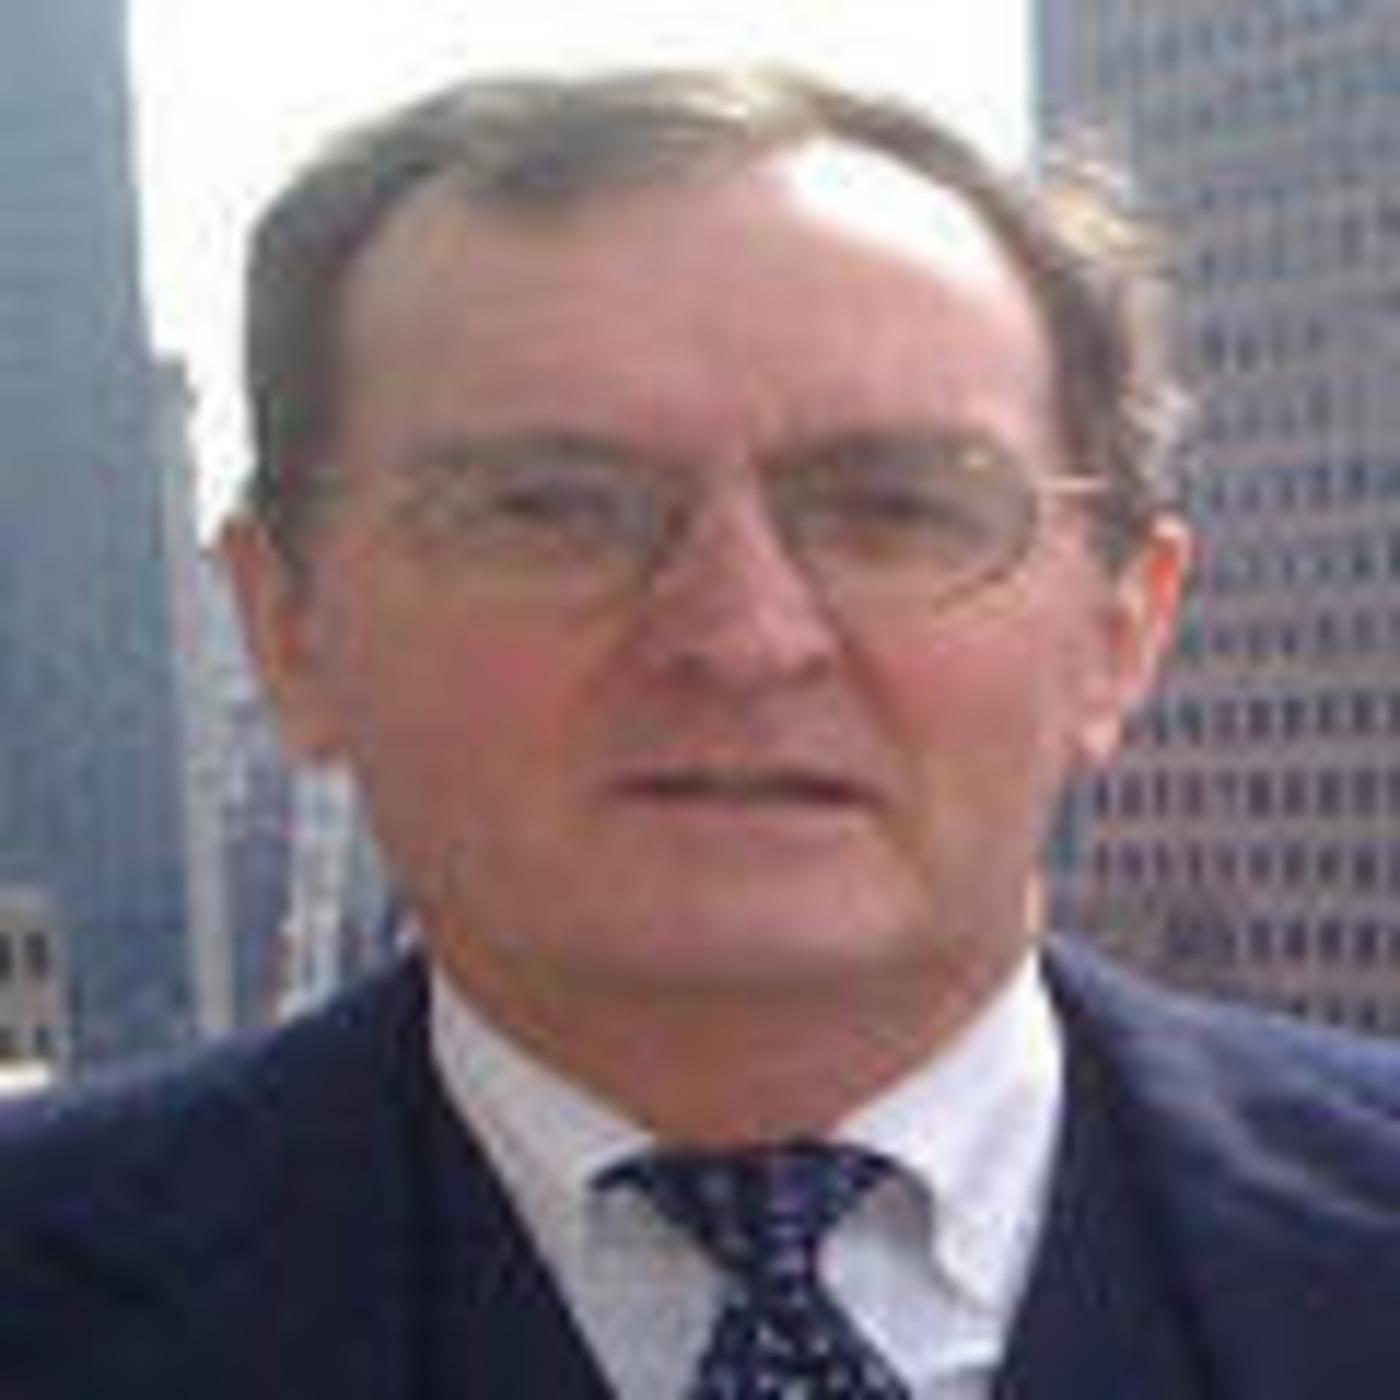 John Derbyshire